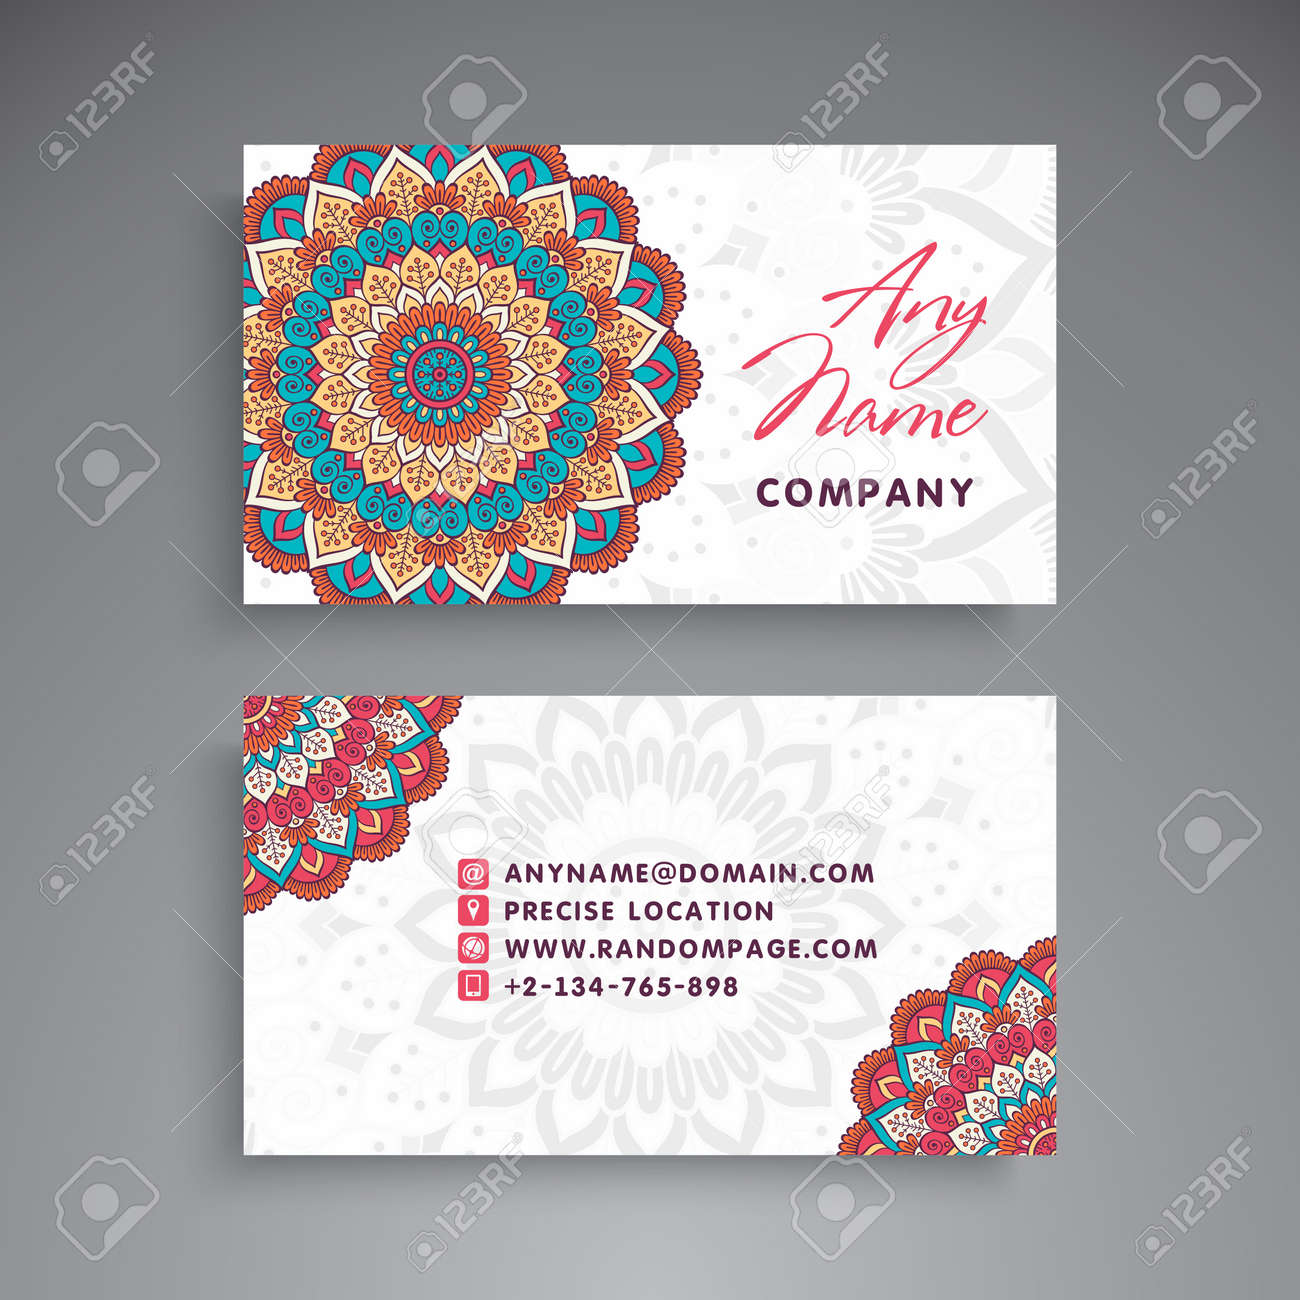 Business card vintage decorative elements ornamental floral business card vintage decorative elements ornamental floral business cards or invitation with mandala stock reheart Choice Image